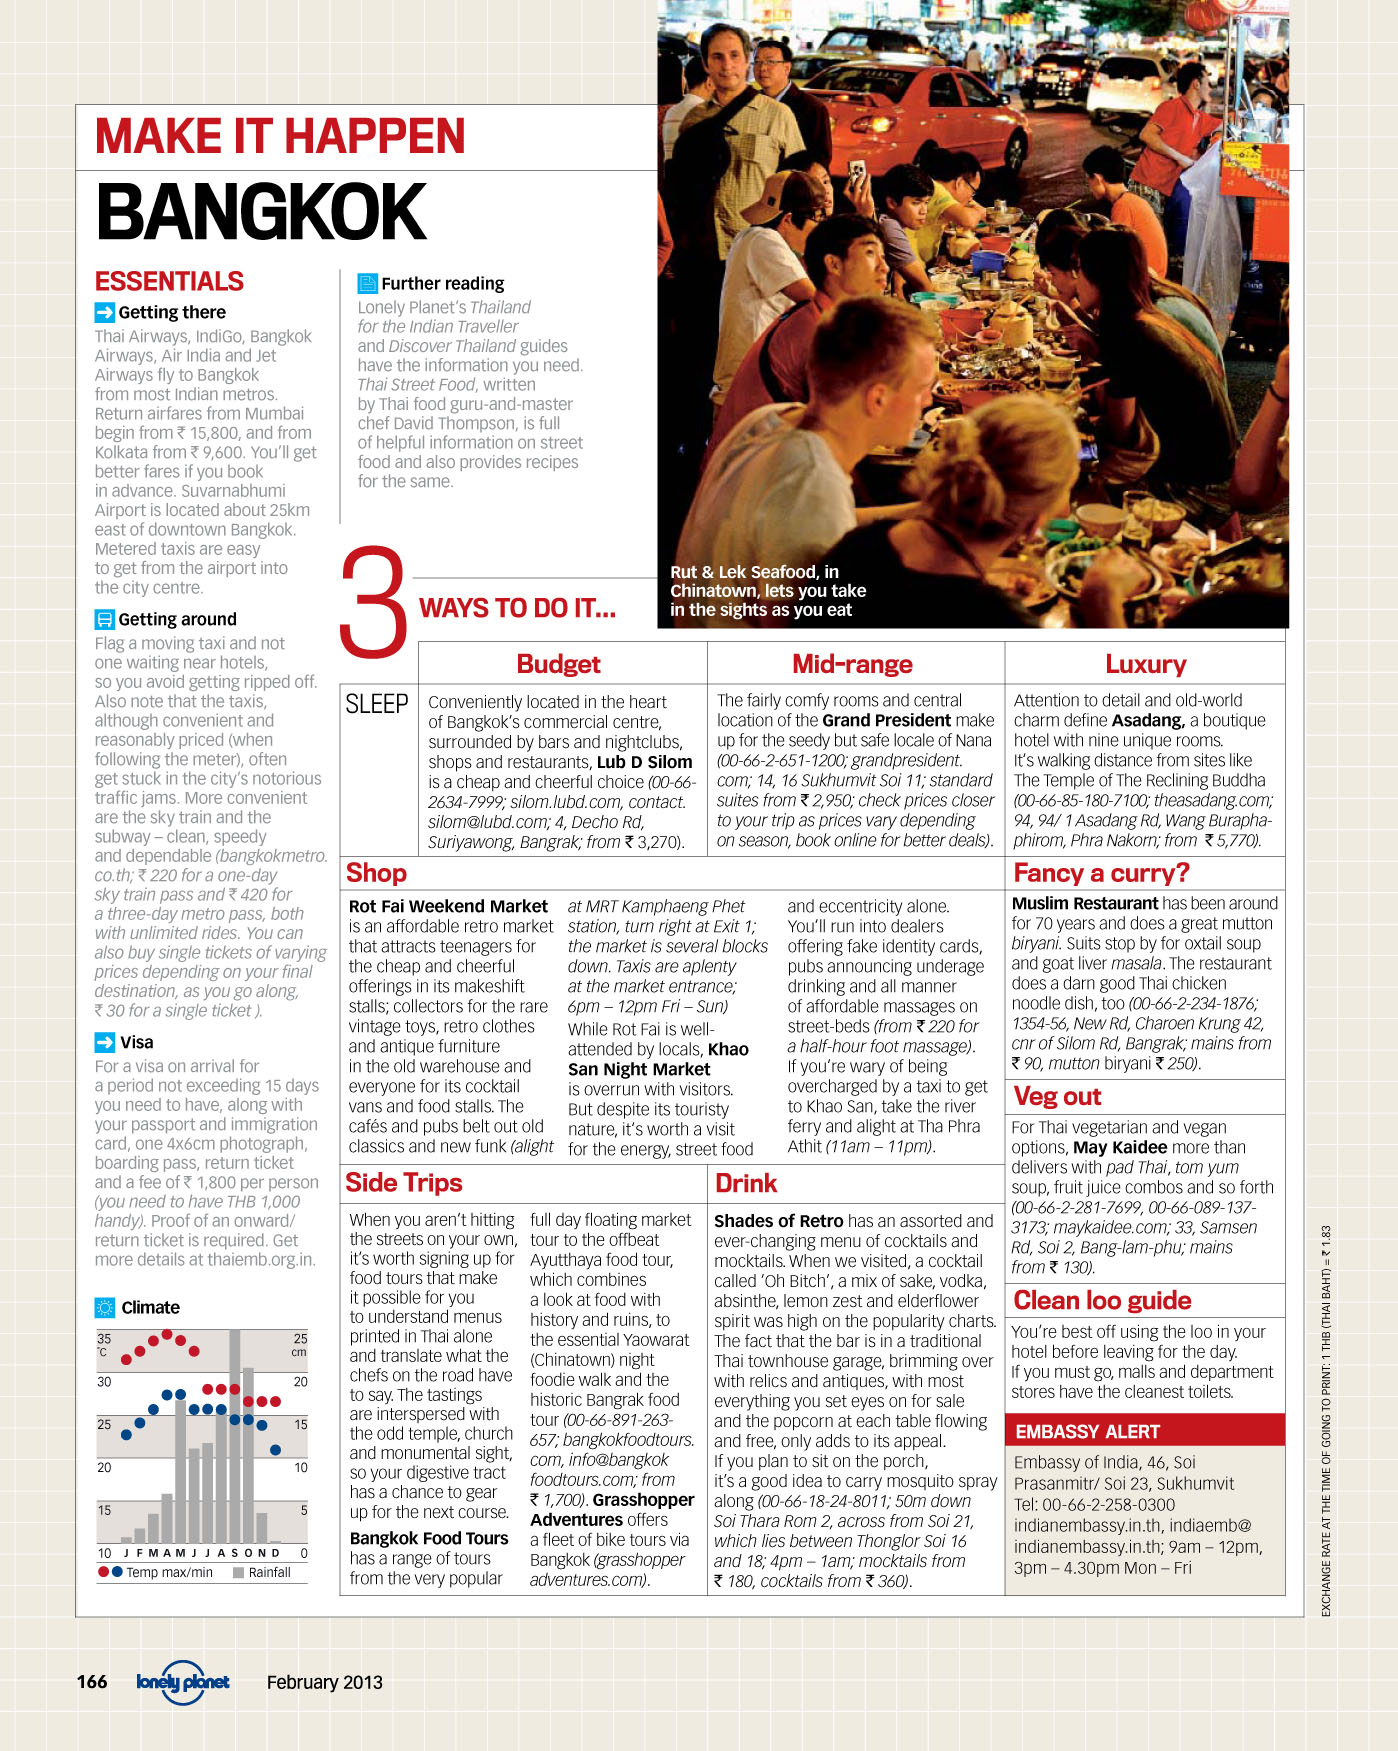 Lonely Planet Magazine India 2013-02-09.jpg